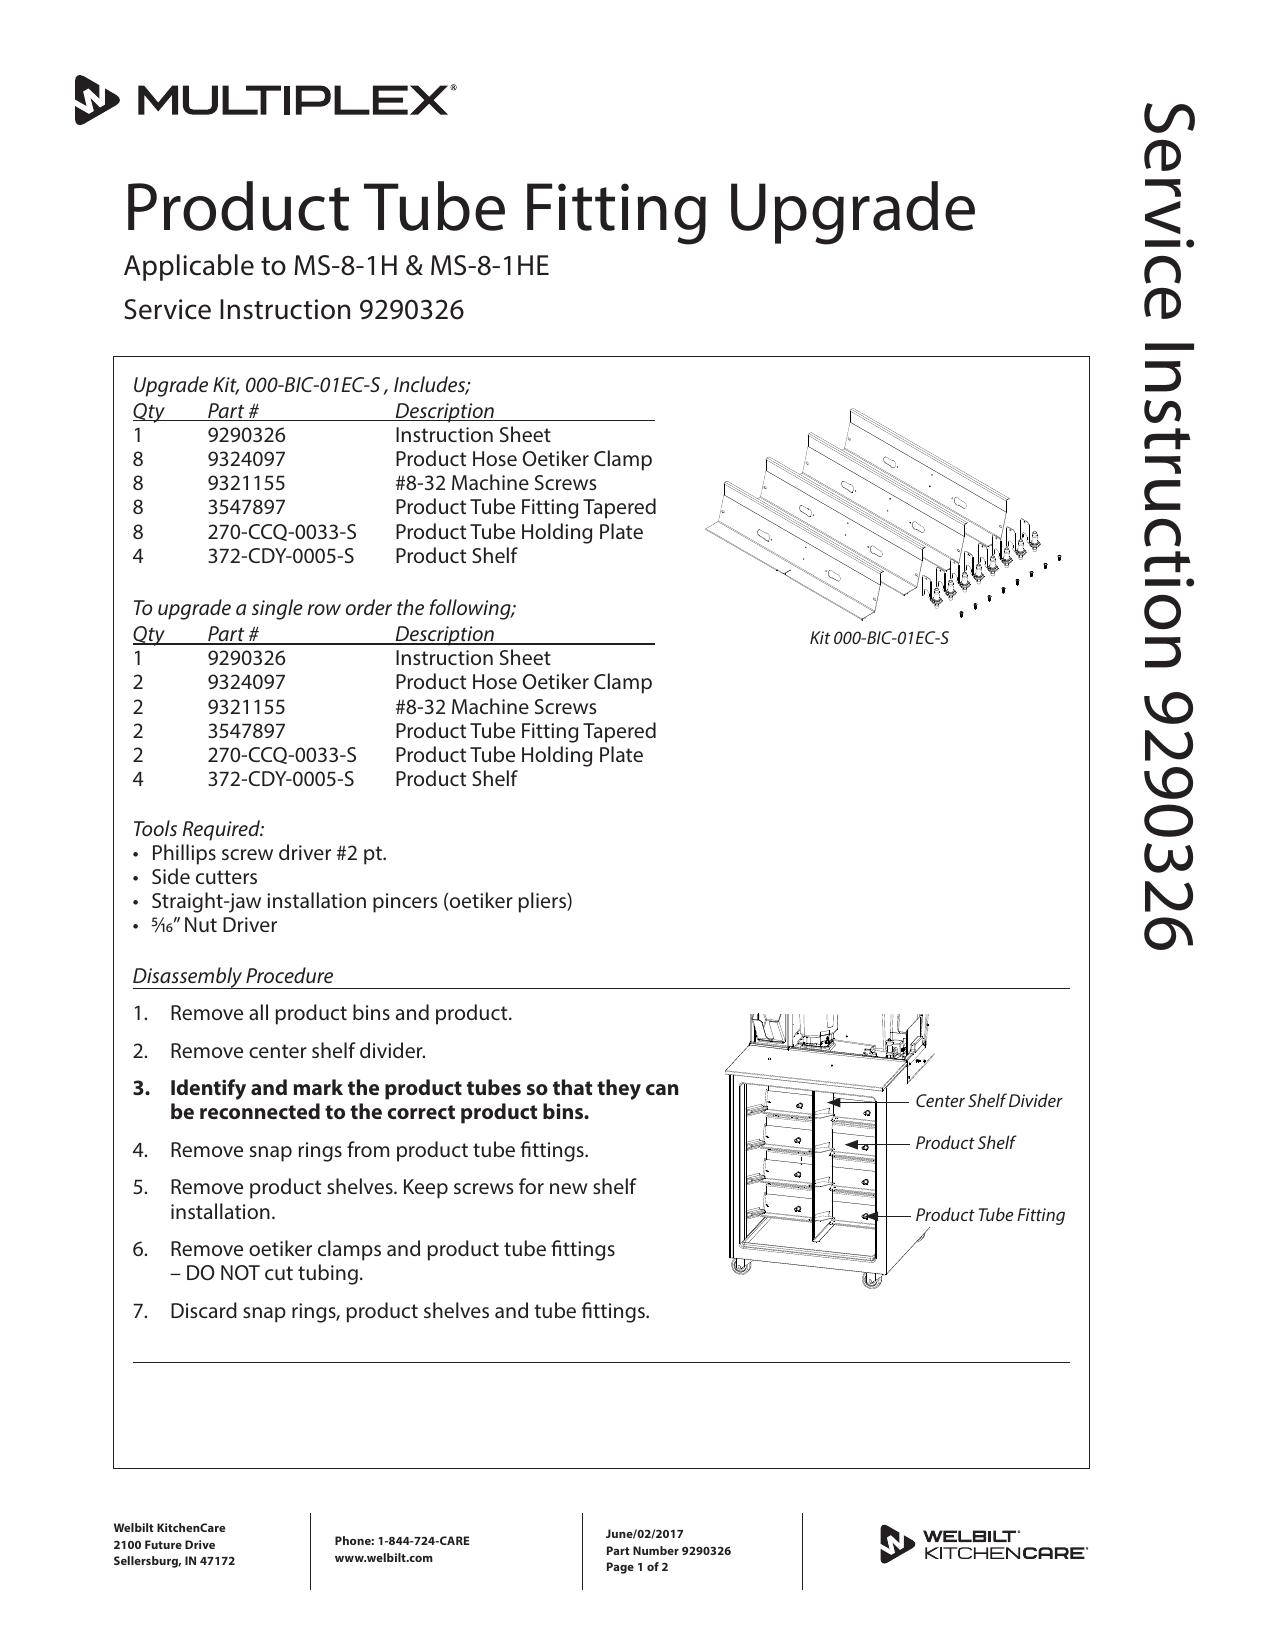 Multiplex Bim Product Tube Fitting Upgrade 92903269290326 Bim User Manual Manualzz